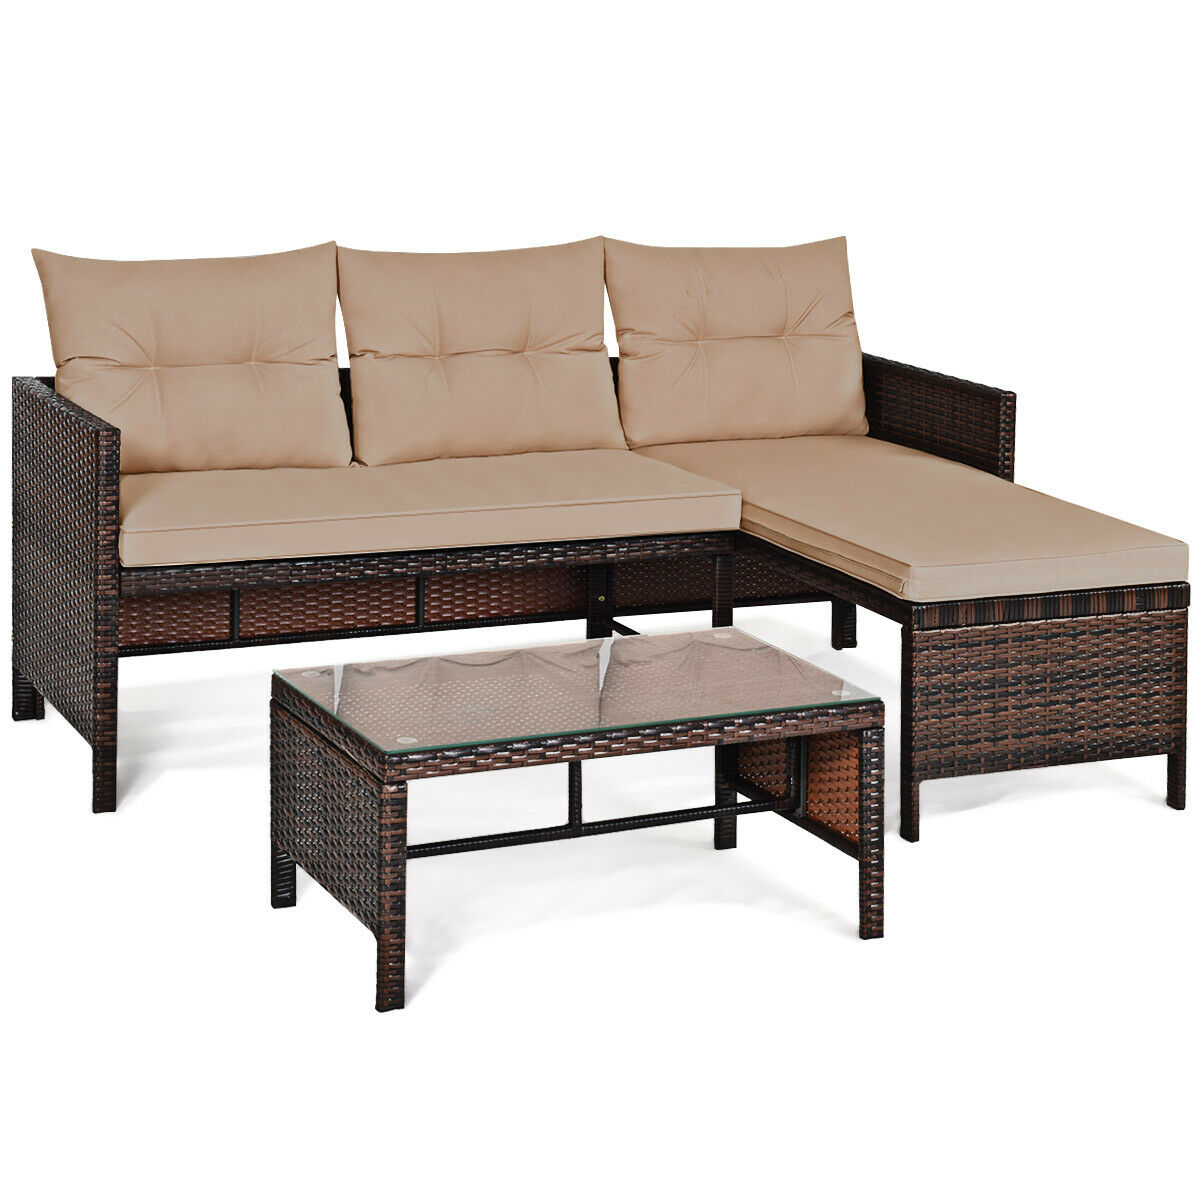 Costway 3PCS Patio Wicker Rattan Sofa Set Outdoor Sectional Conversation Set Garden Lawn HW63870